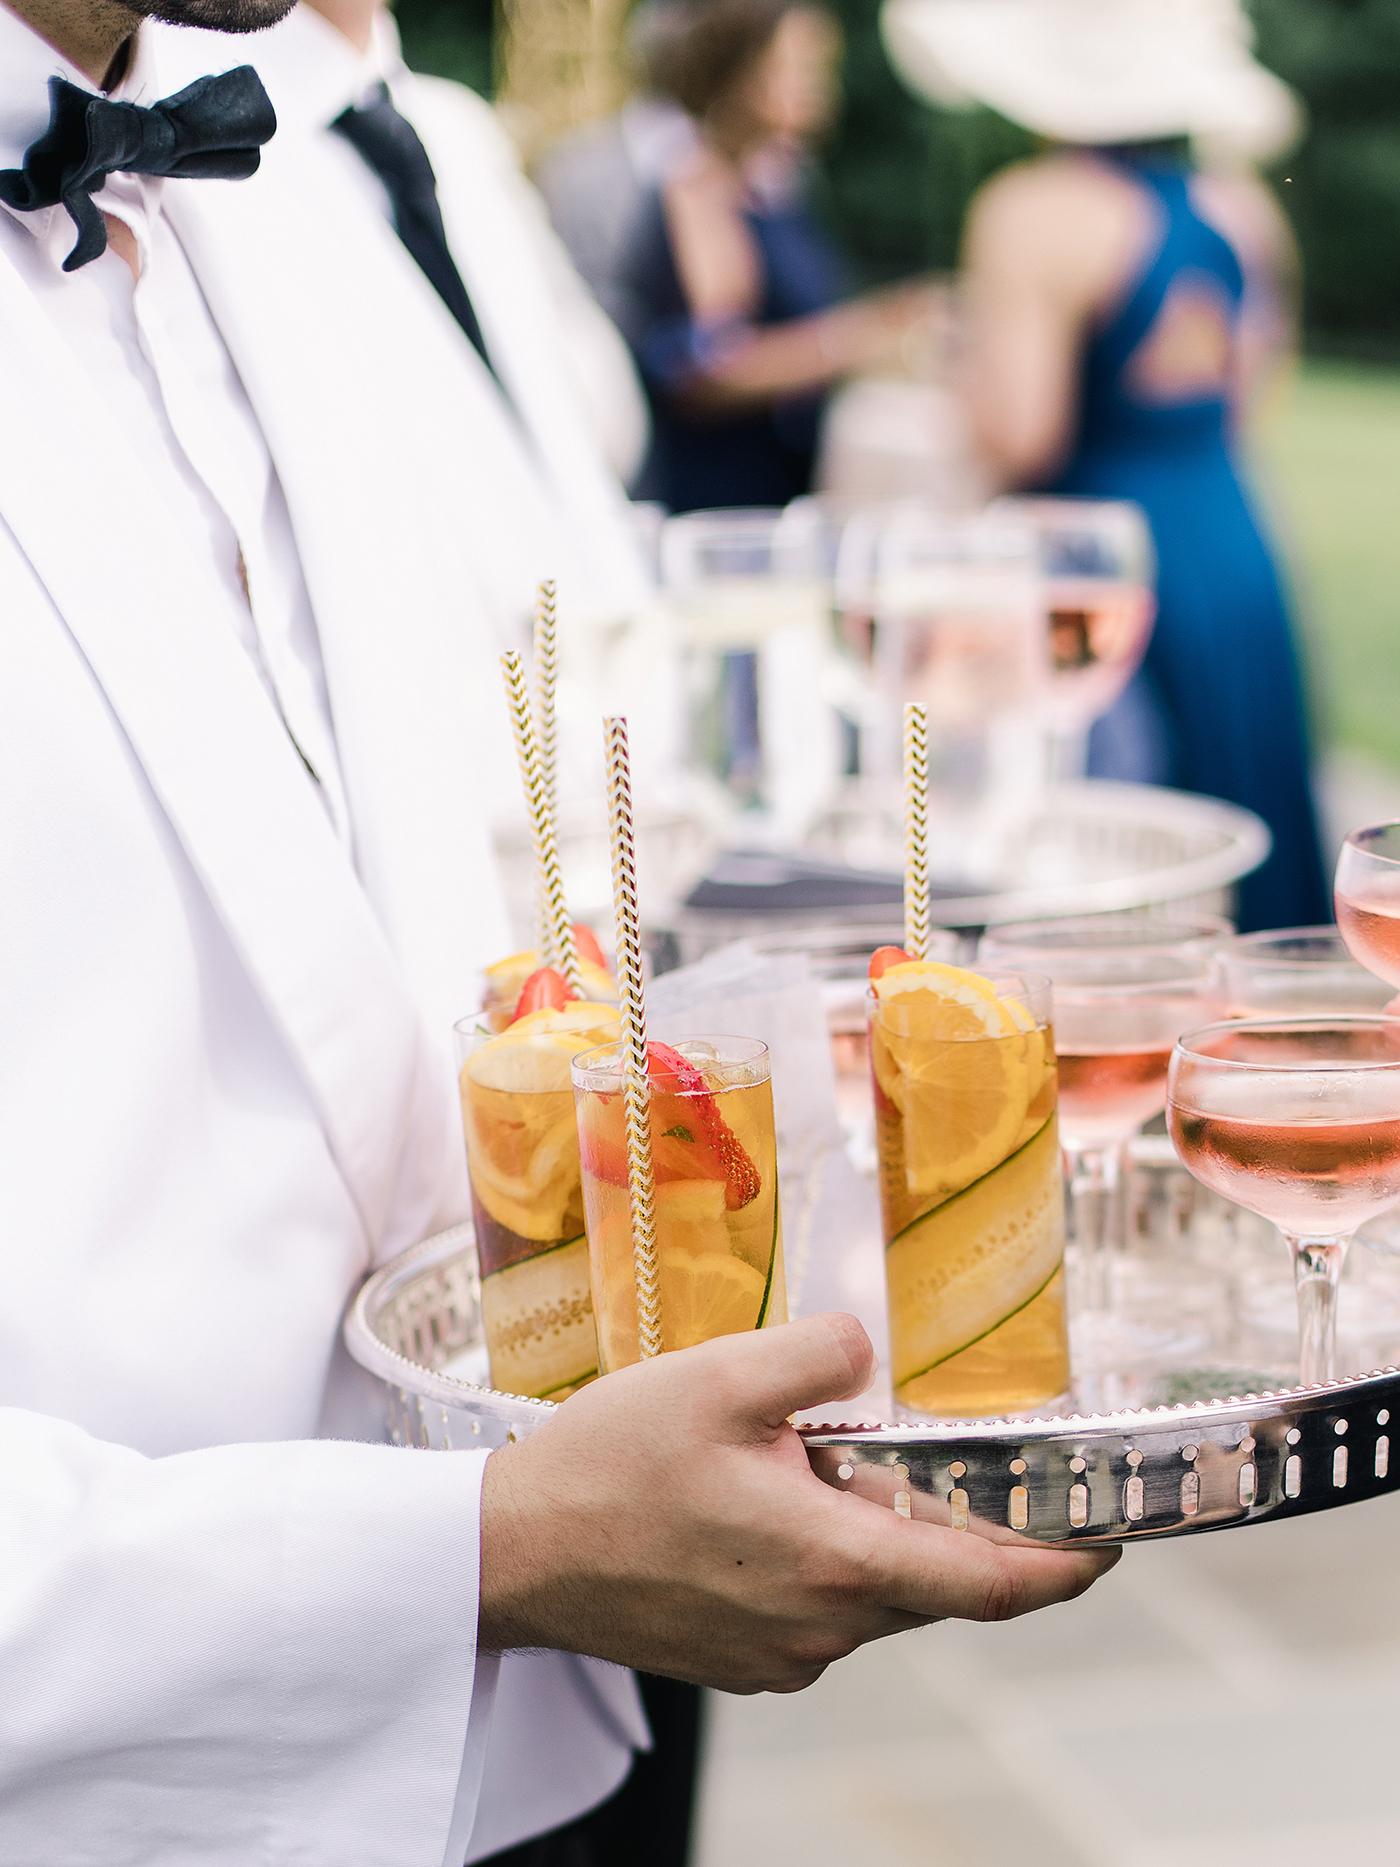 pillar paul wedding cocktails on tray